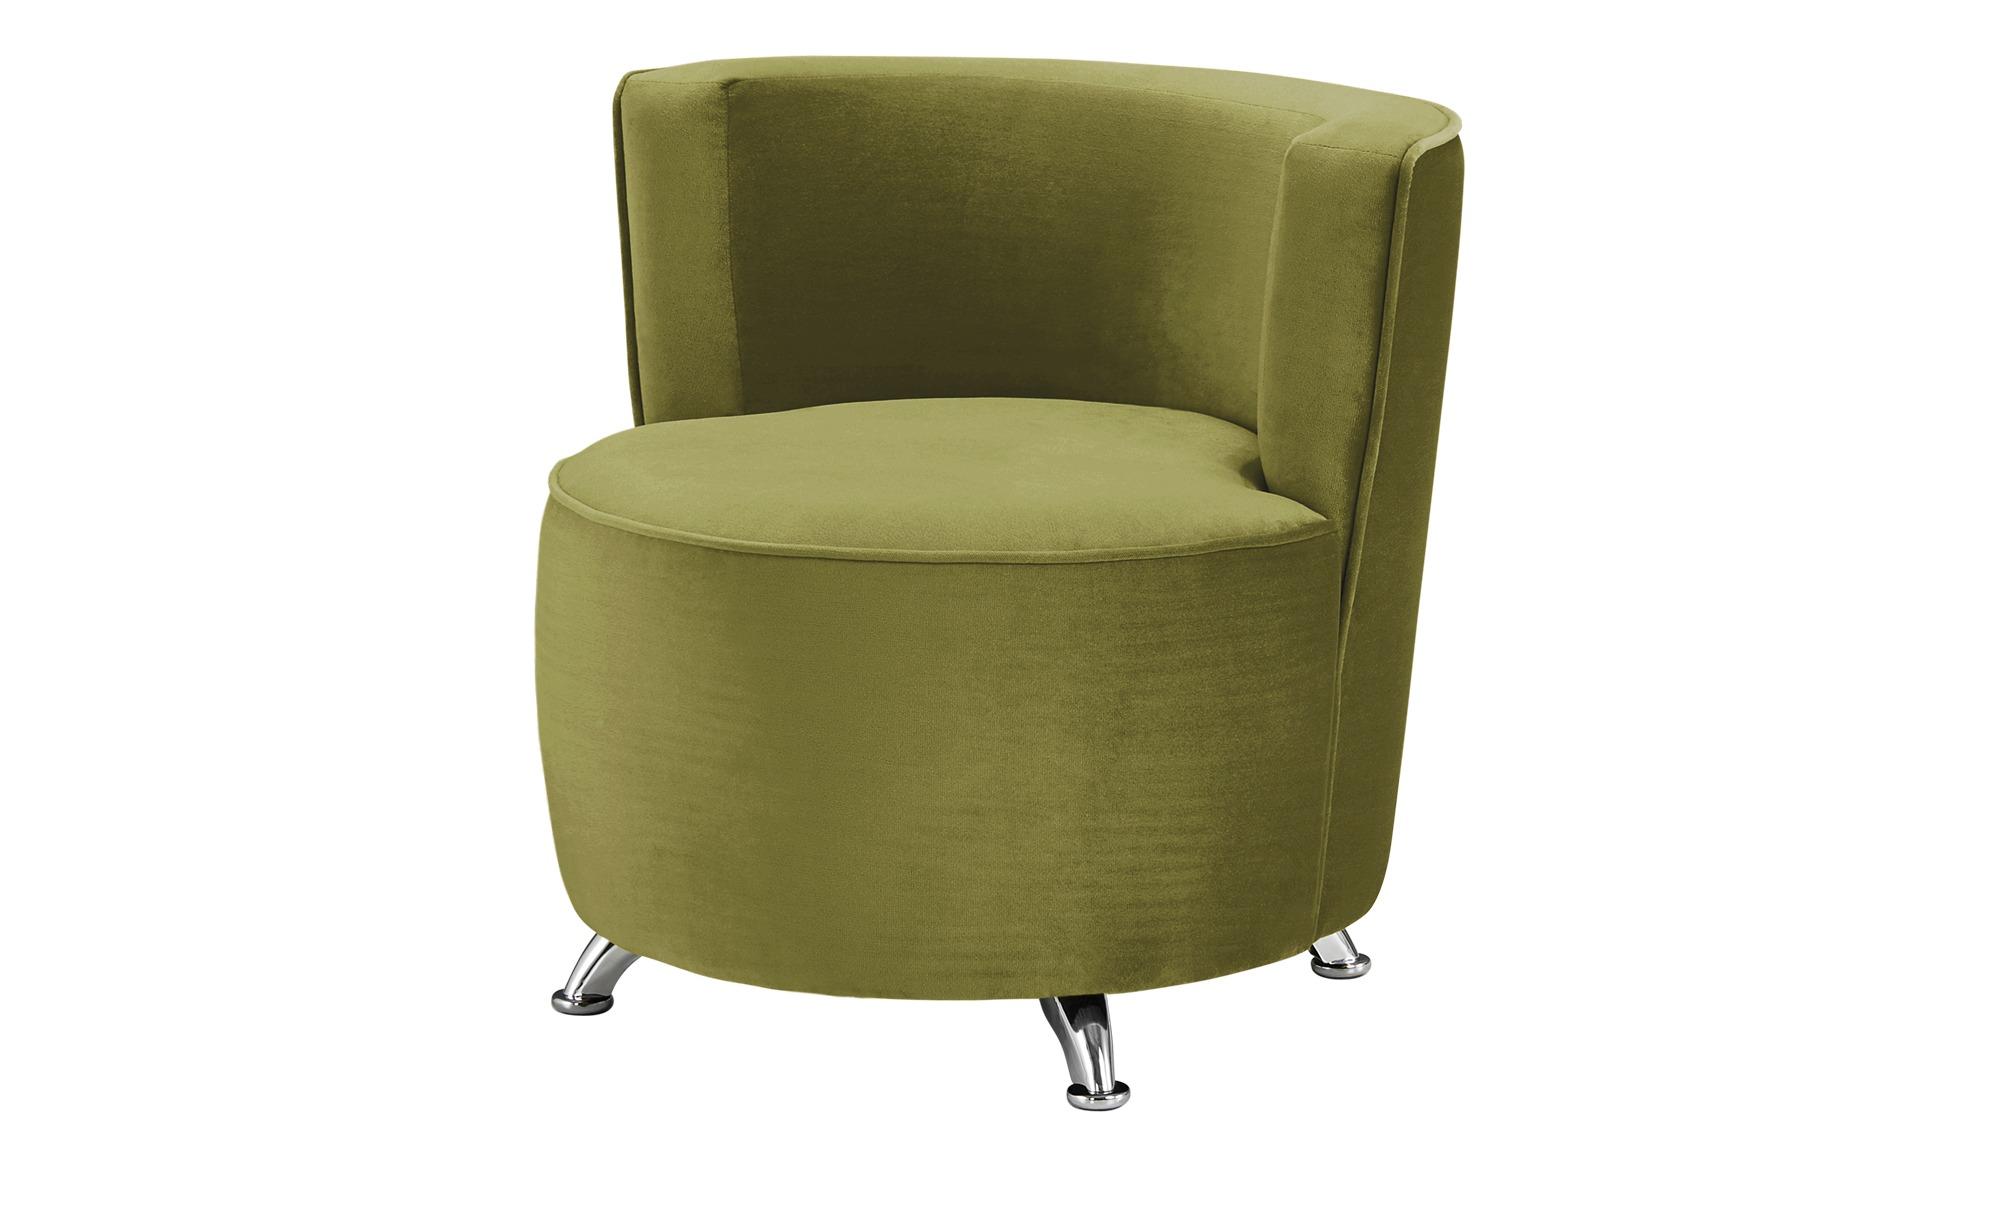 smart Sessel grün - Stoff Baby